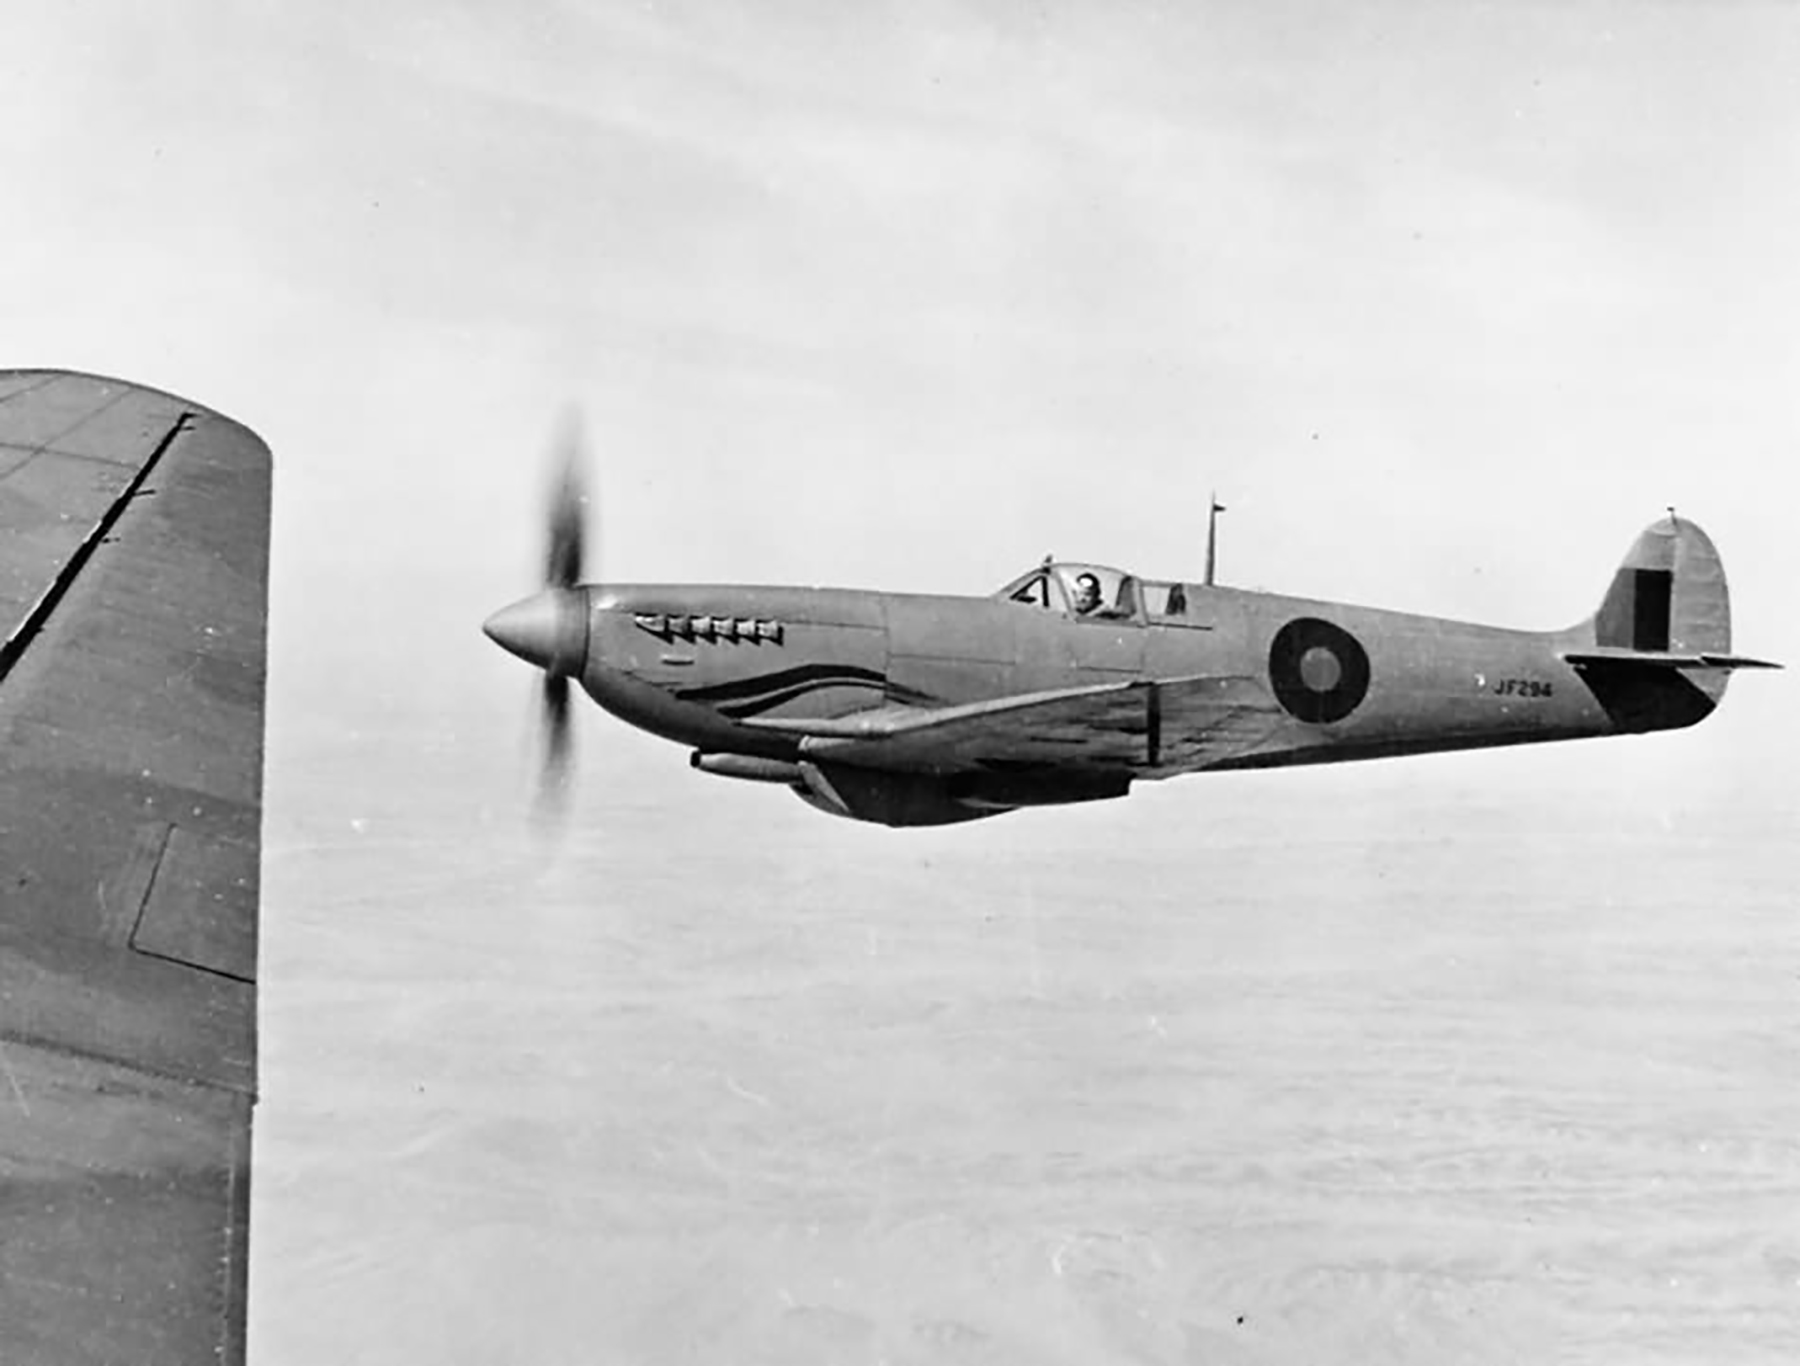 Recon Spitfire MkVIII RAF JF294 recon aircraft Mar 1944 web 01